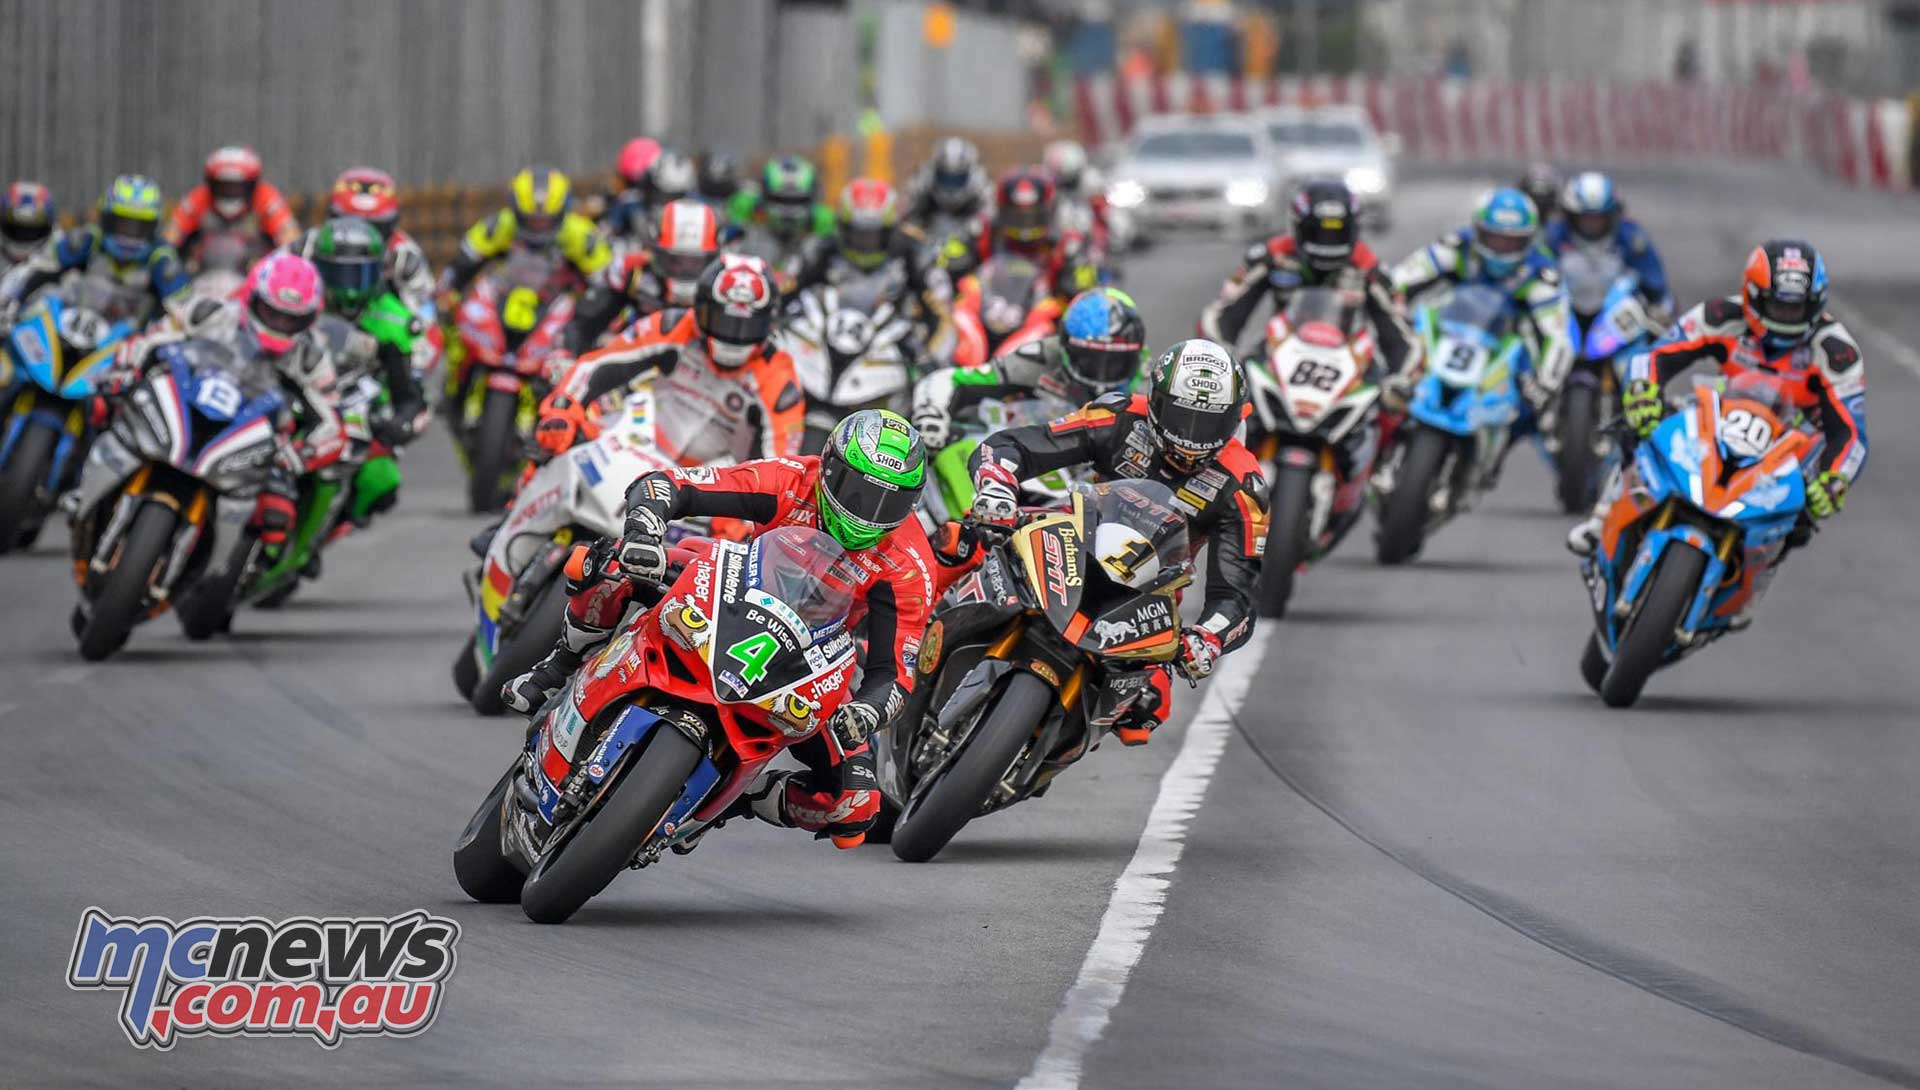 Macau Grand Prix 2017 >> John Mcguinness To Race Factory Ducati At Macau Gp Mcnews